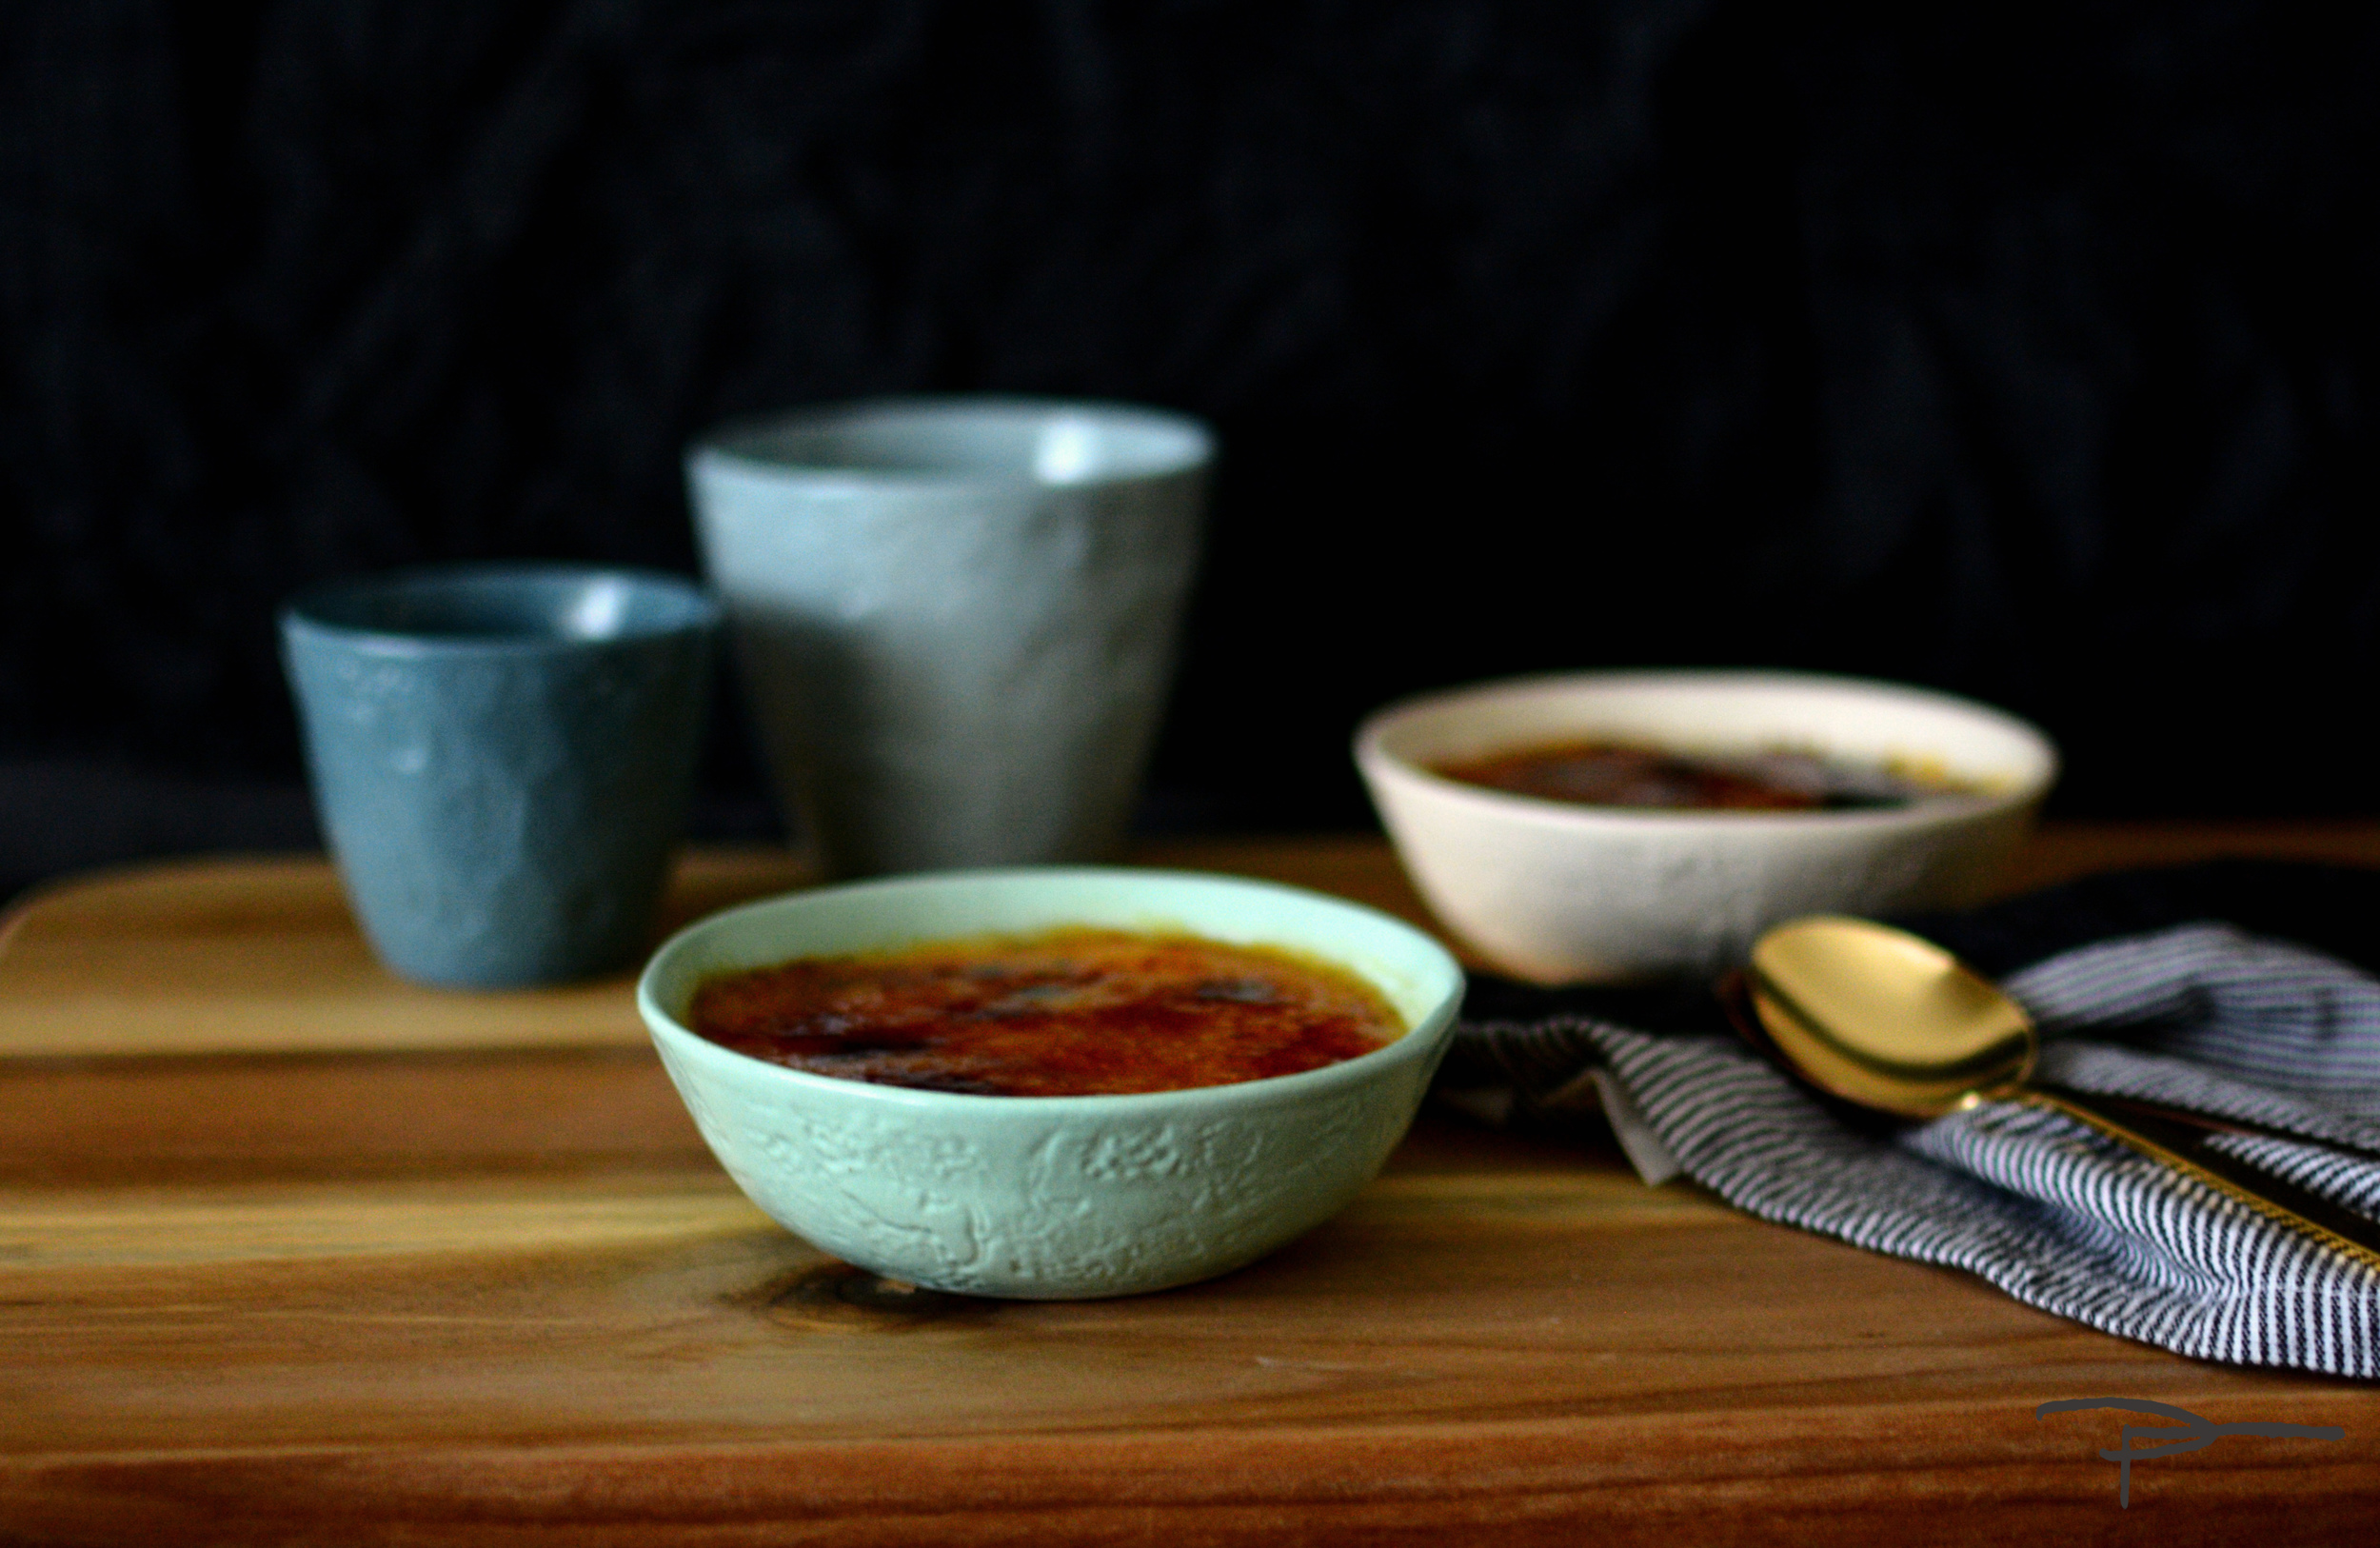 Mocha Creme Brûlée baked in Nibble bowls